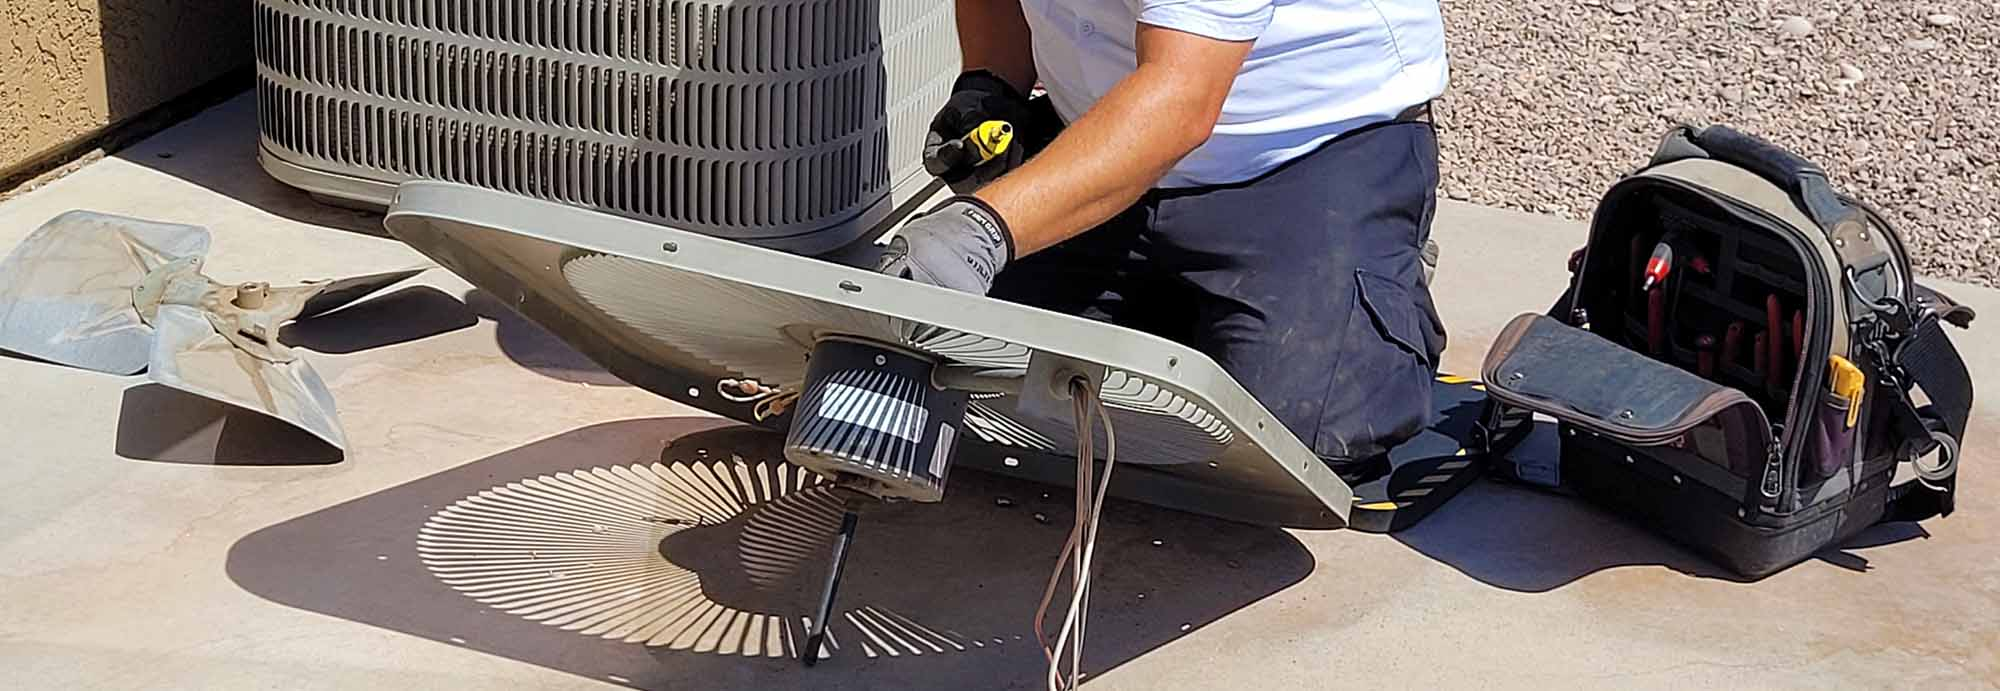 Your Guide to Choosing a HVAC Technician